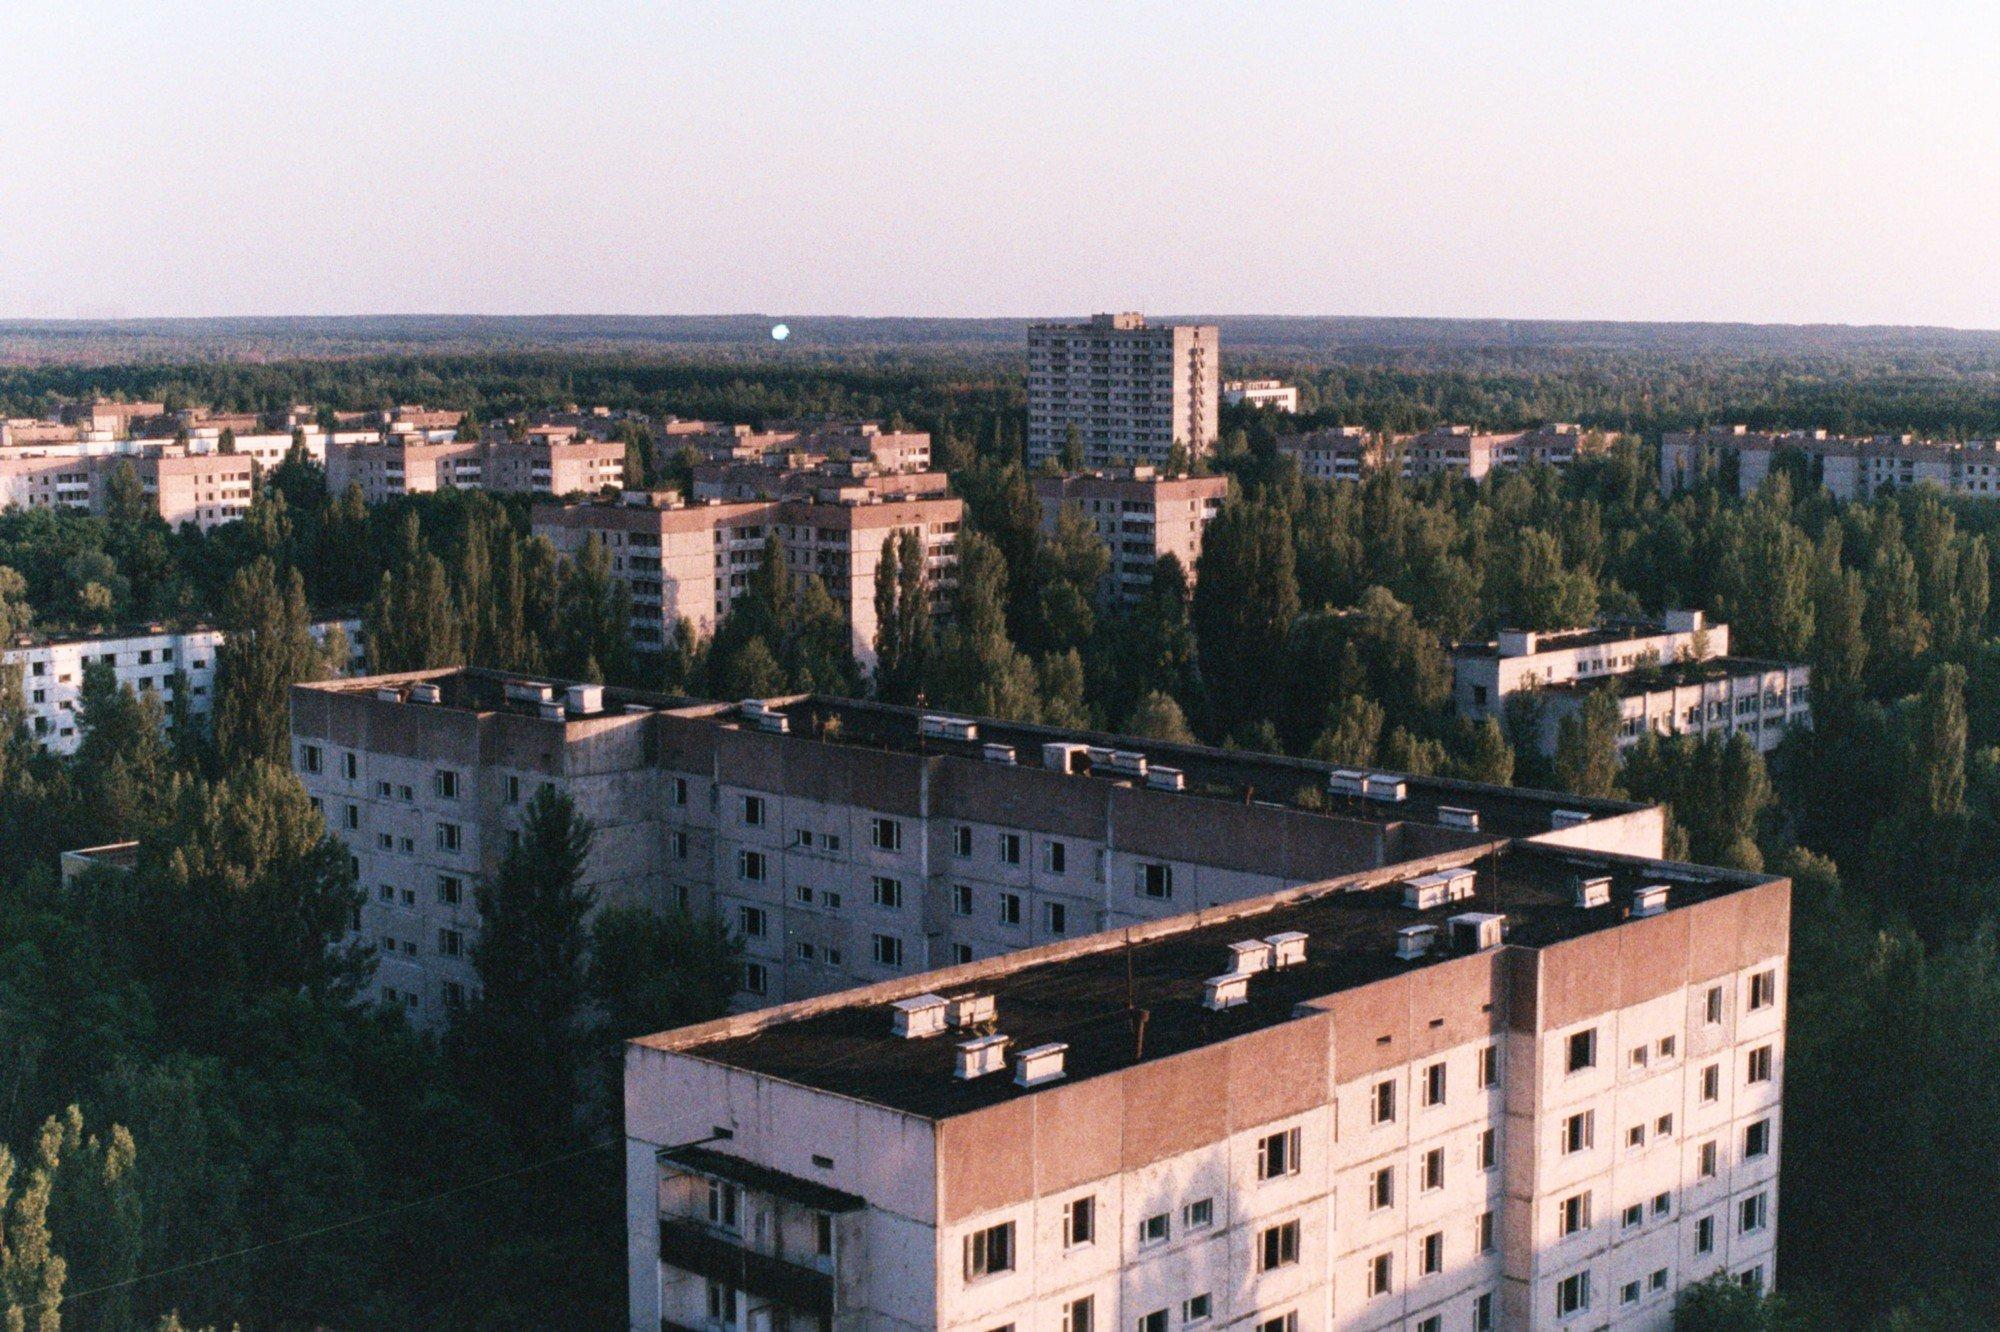 snaeking-into-chernobyl12 SNEAKING INTO CHERNOBYL